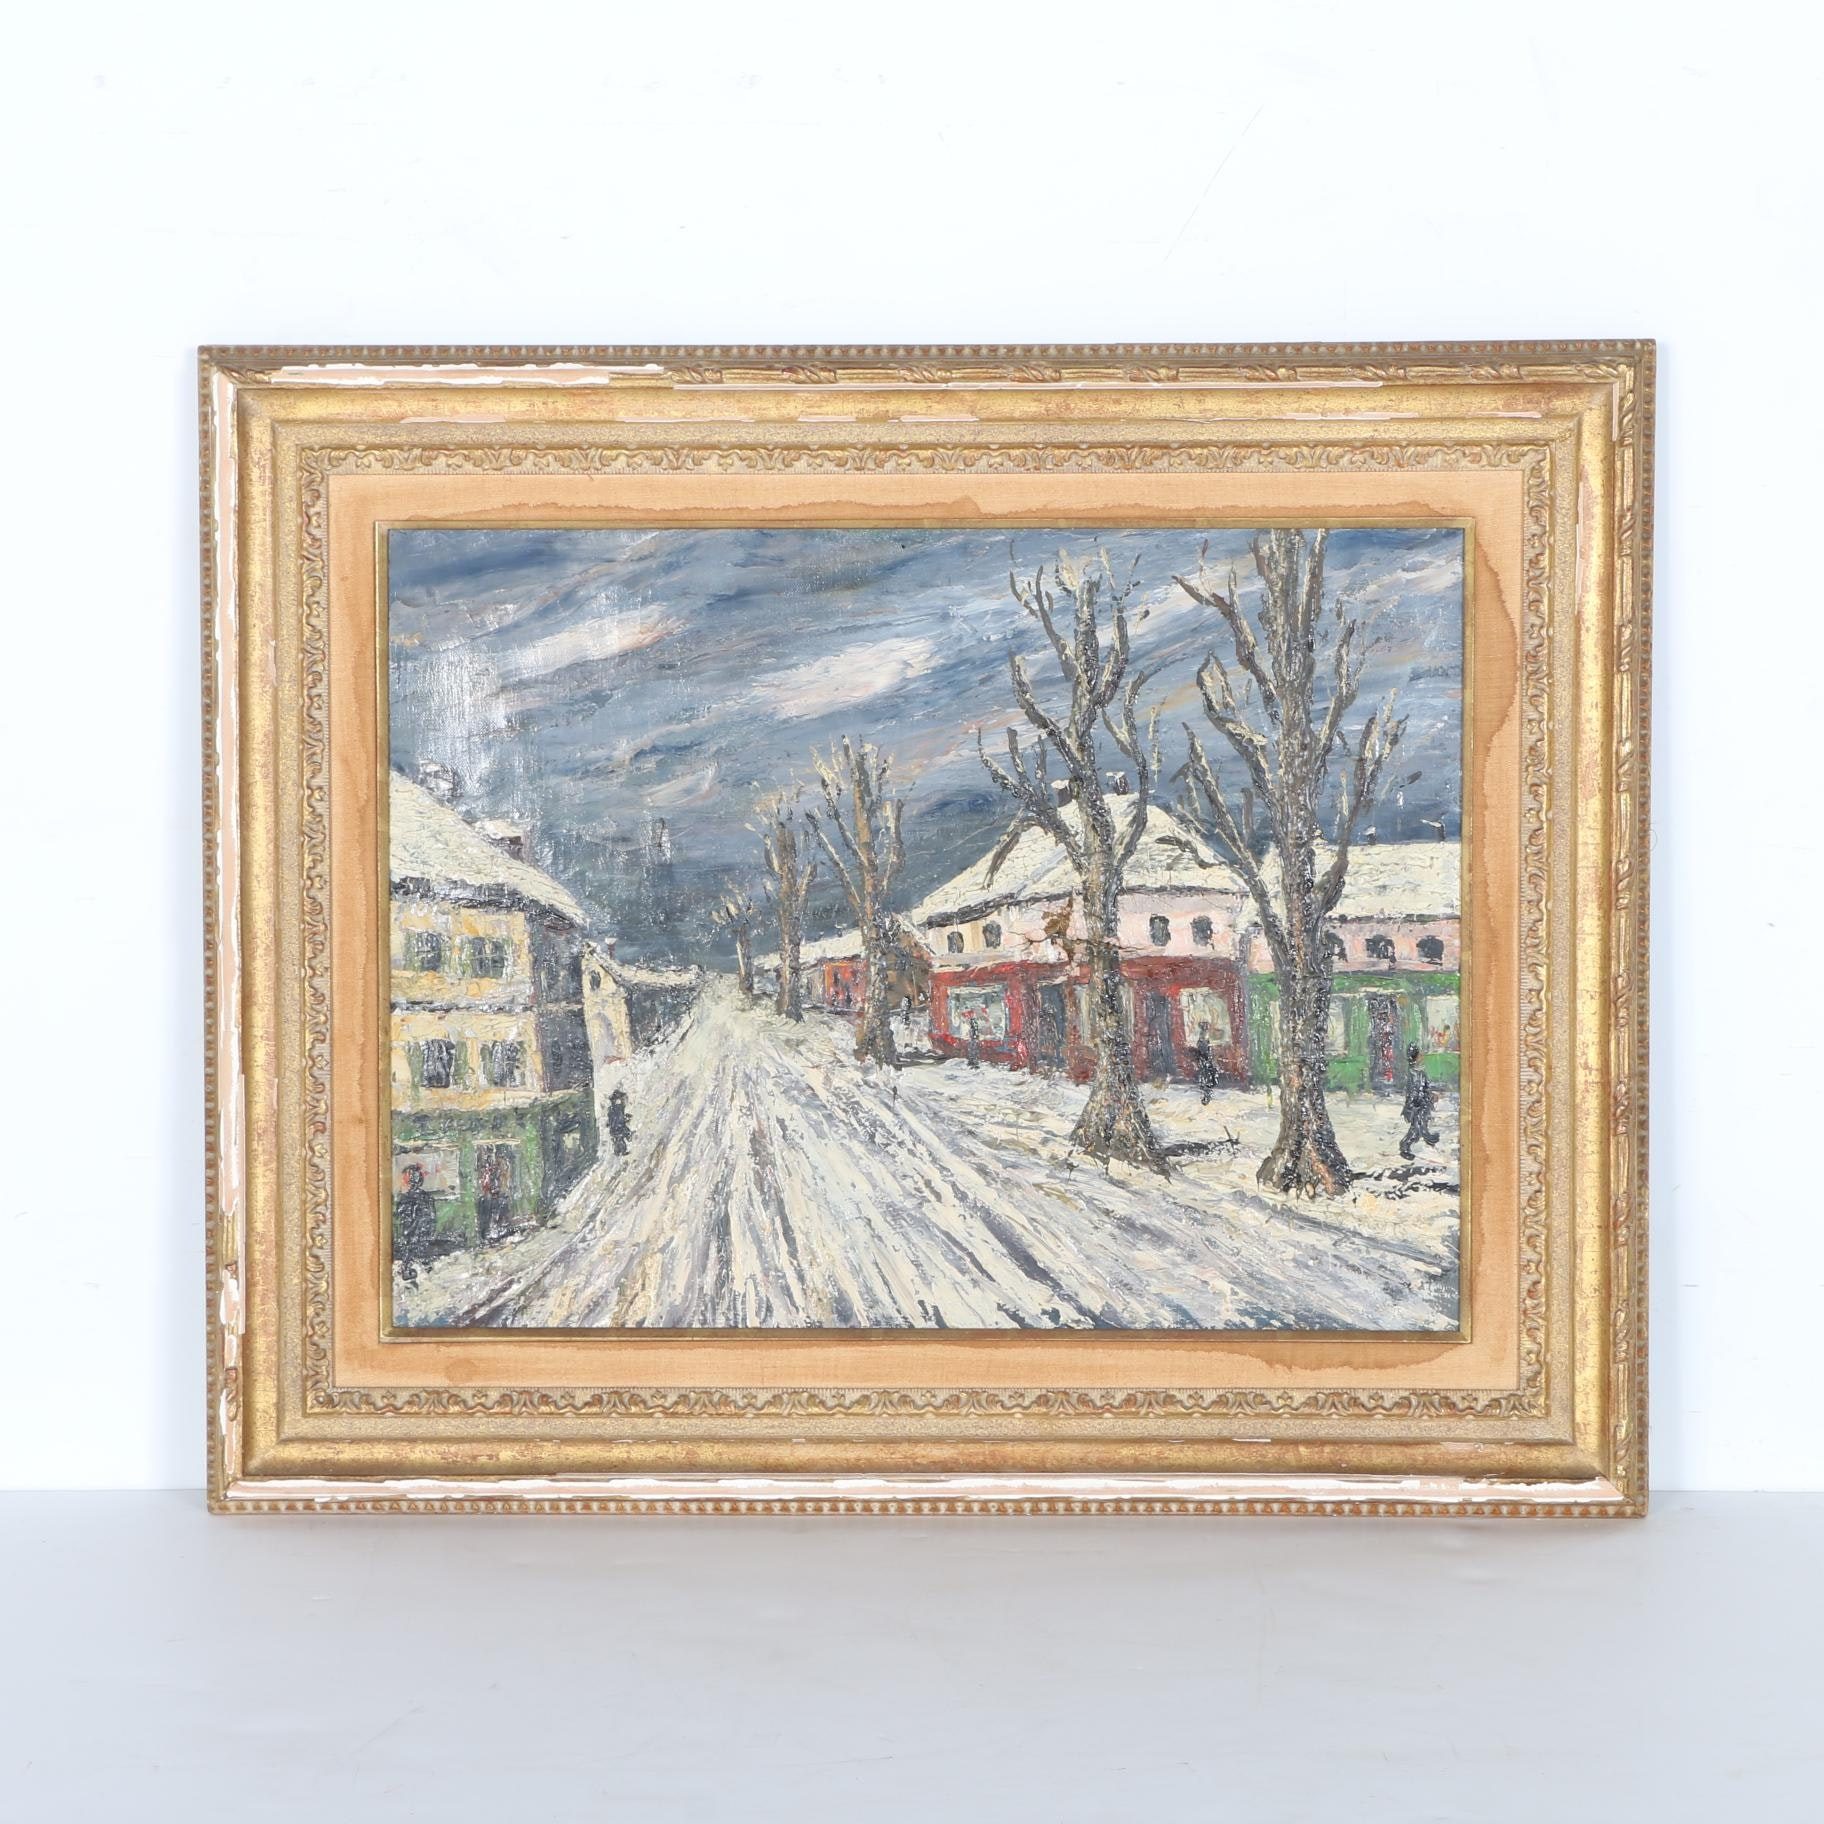 Original Oil on Canvas Painting of Winter Scene